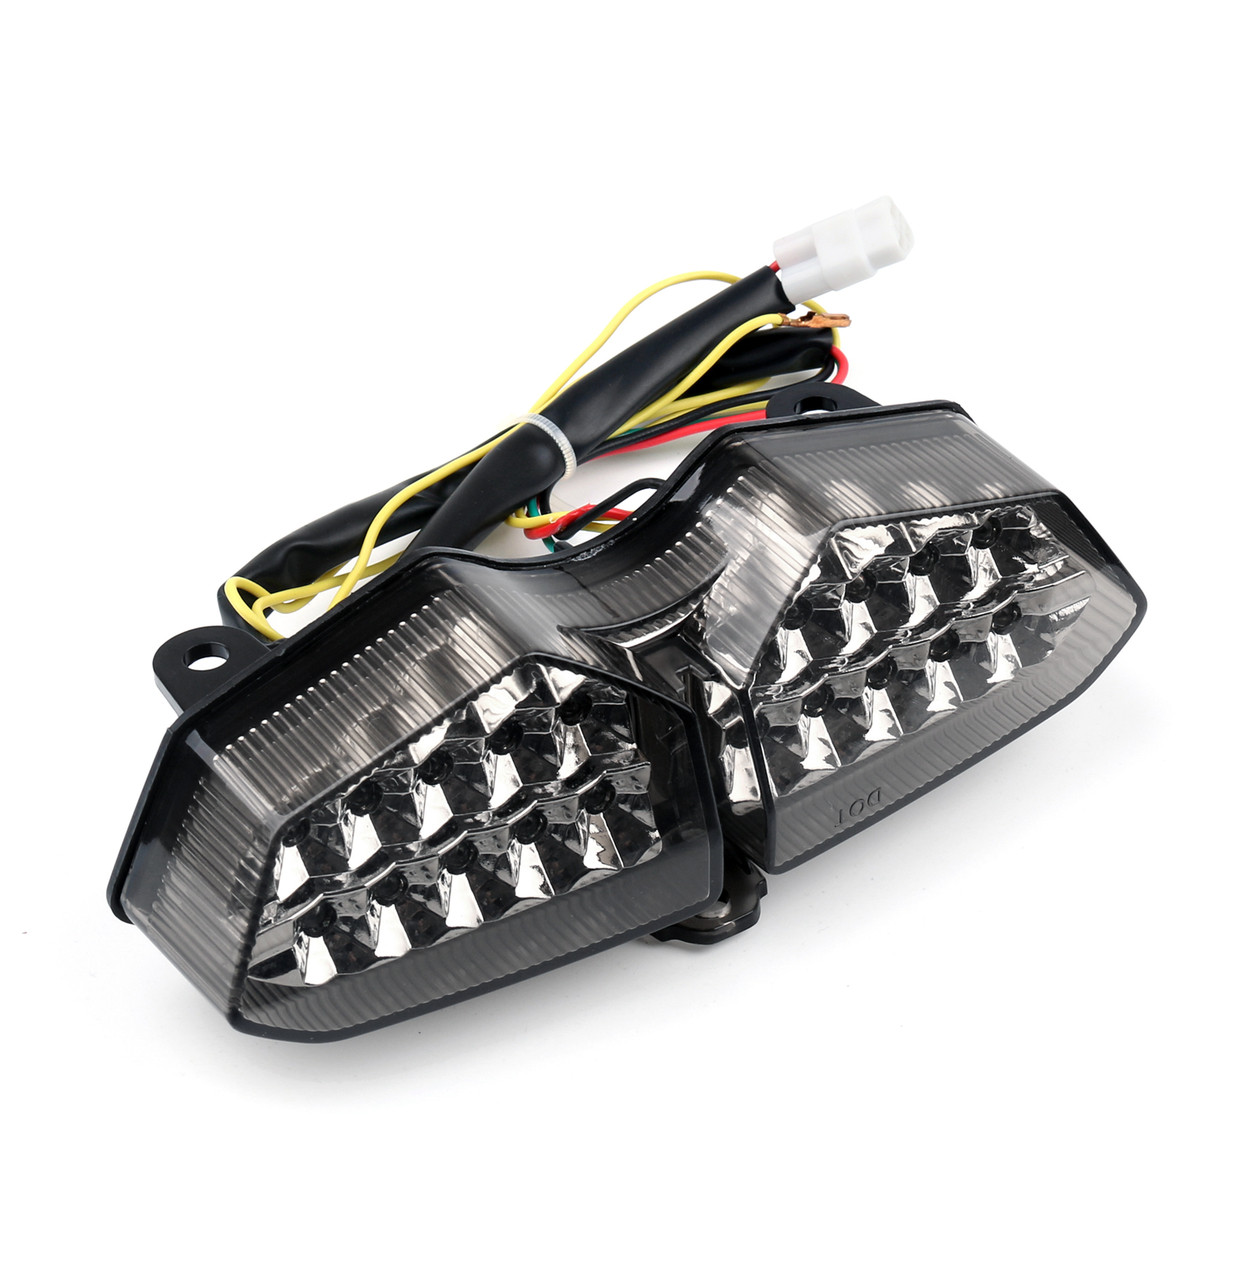 http://www.madhornets.store/AMZ/MotoPart/Taillight/TL-319/TL-319-Smoke-4.jpg